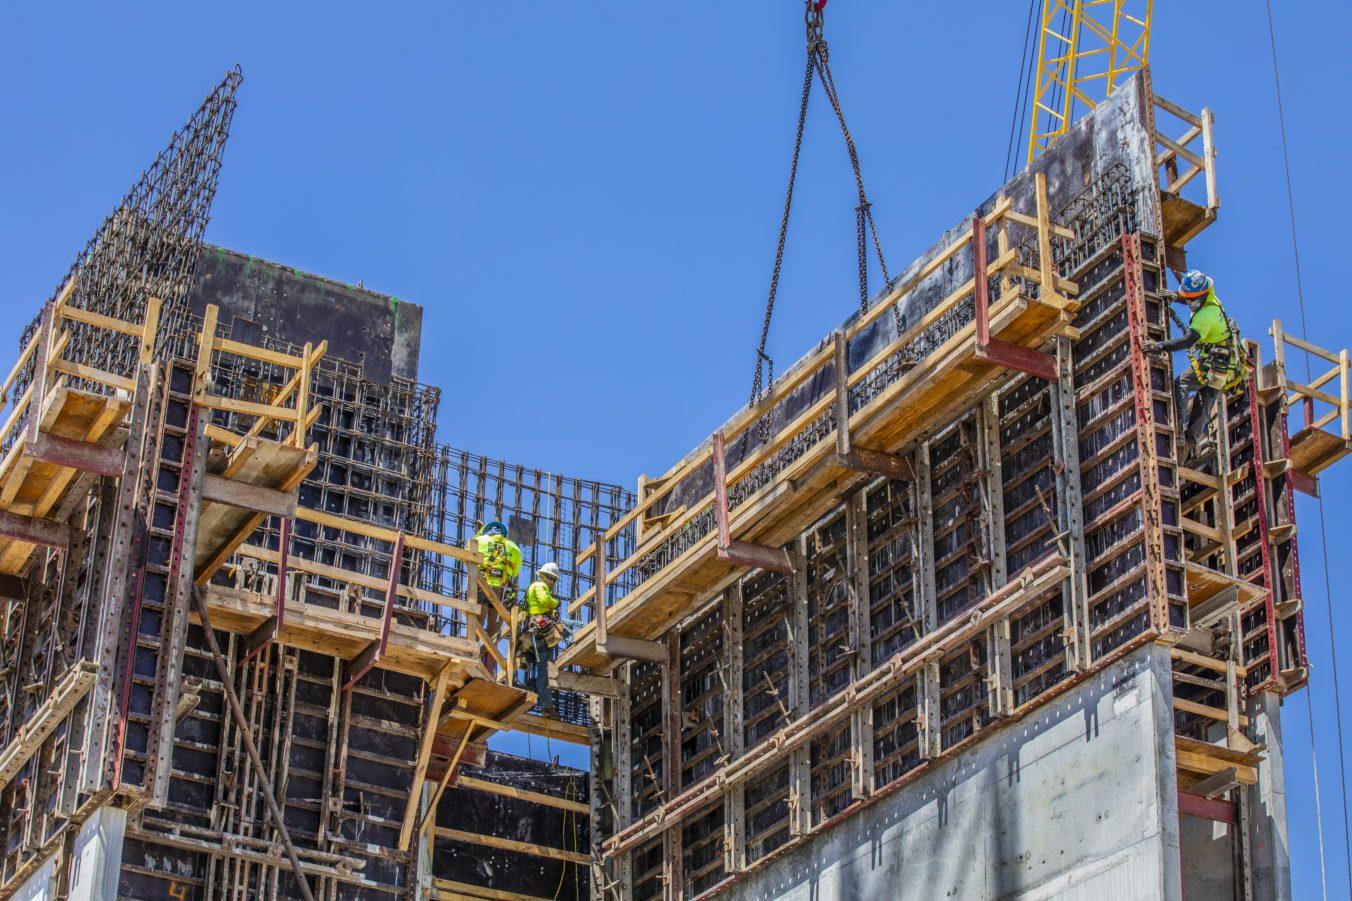 Barton Malow self-performing concrete construction on the stadium facility